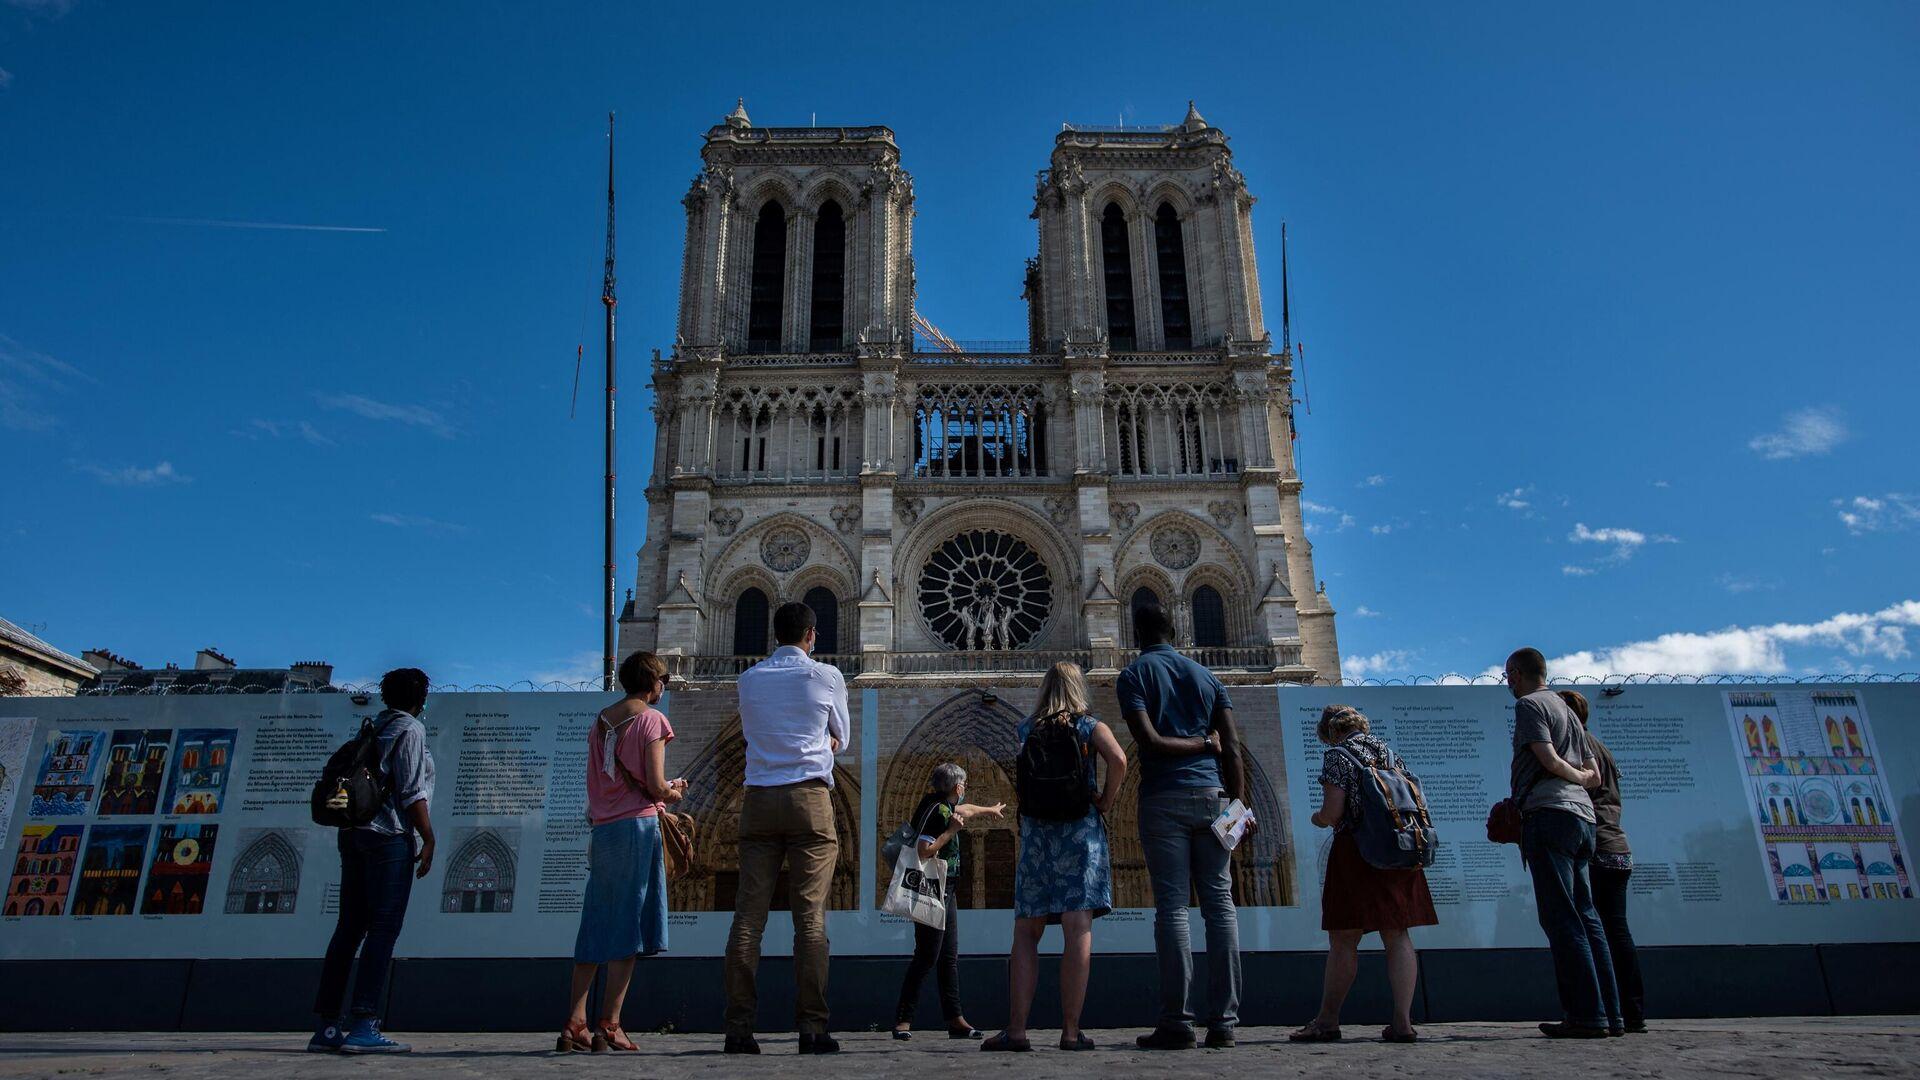 Catedral de Notre Dame en París, Francia - Sputnik Mundo, 1920, 18.05.2021